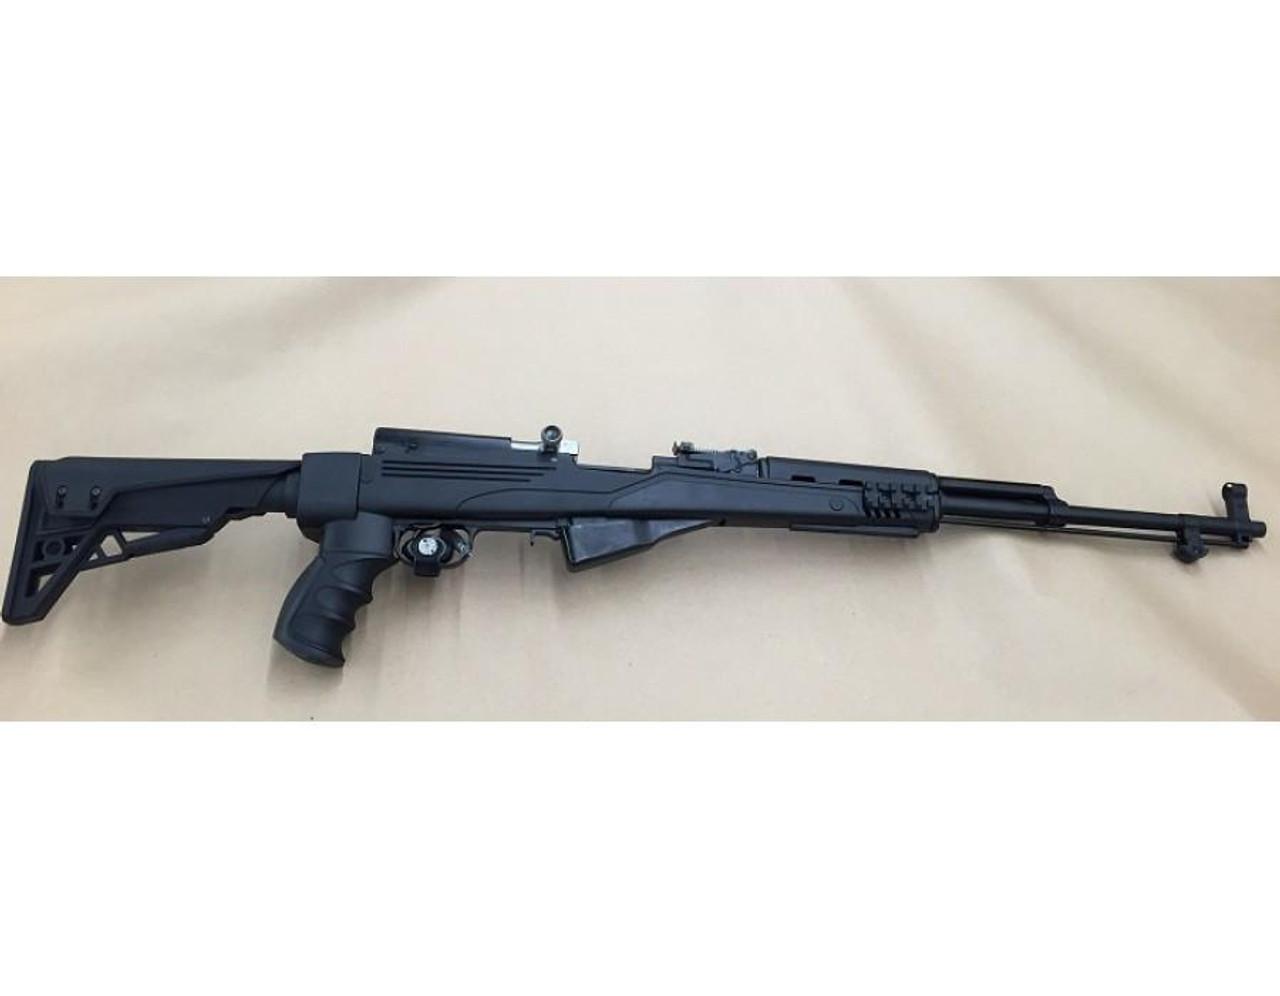 Soviet SKS Rifle 7.62x39 with ATI Folding Stock, No Bayonet